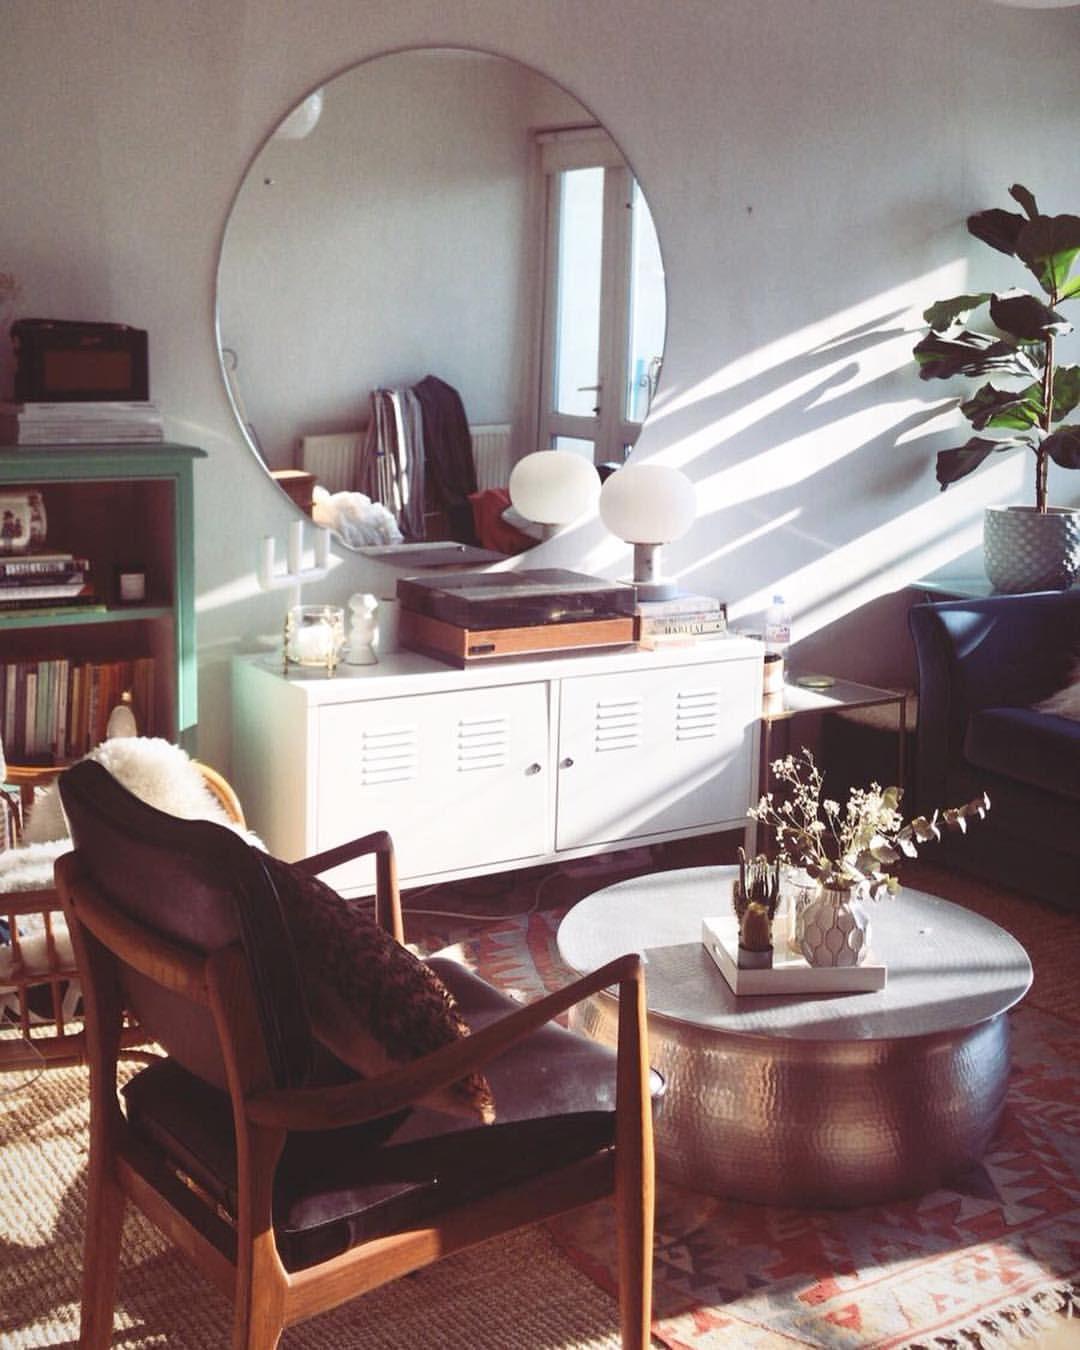 Large Round Mirror Skando Living Room Mid Century Danish Chairs Blue Velvet Sofa Living Room Mirrors Round Dining Room Mirror Dining Room